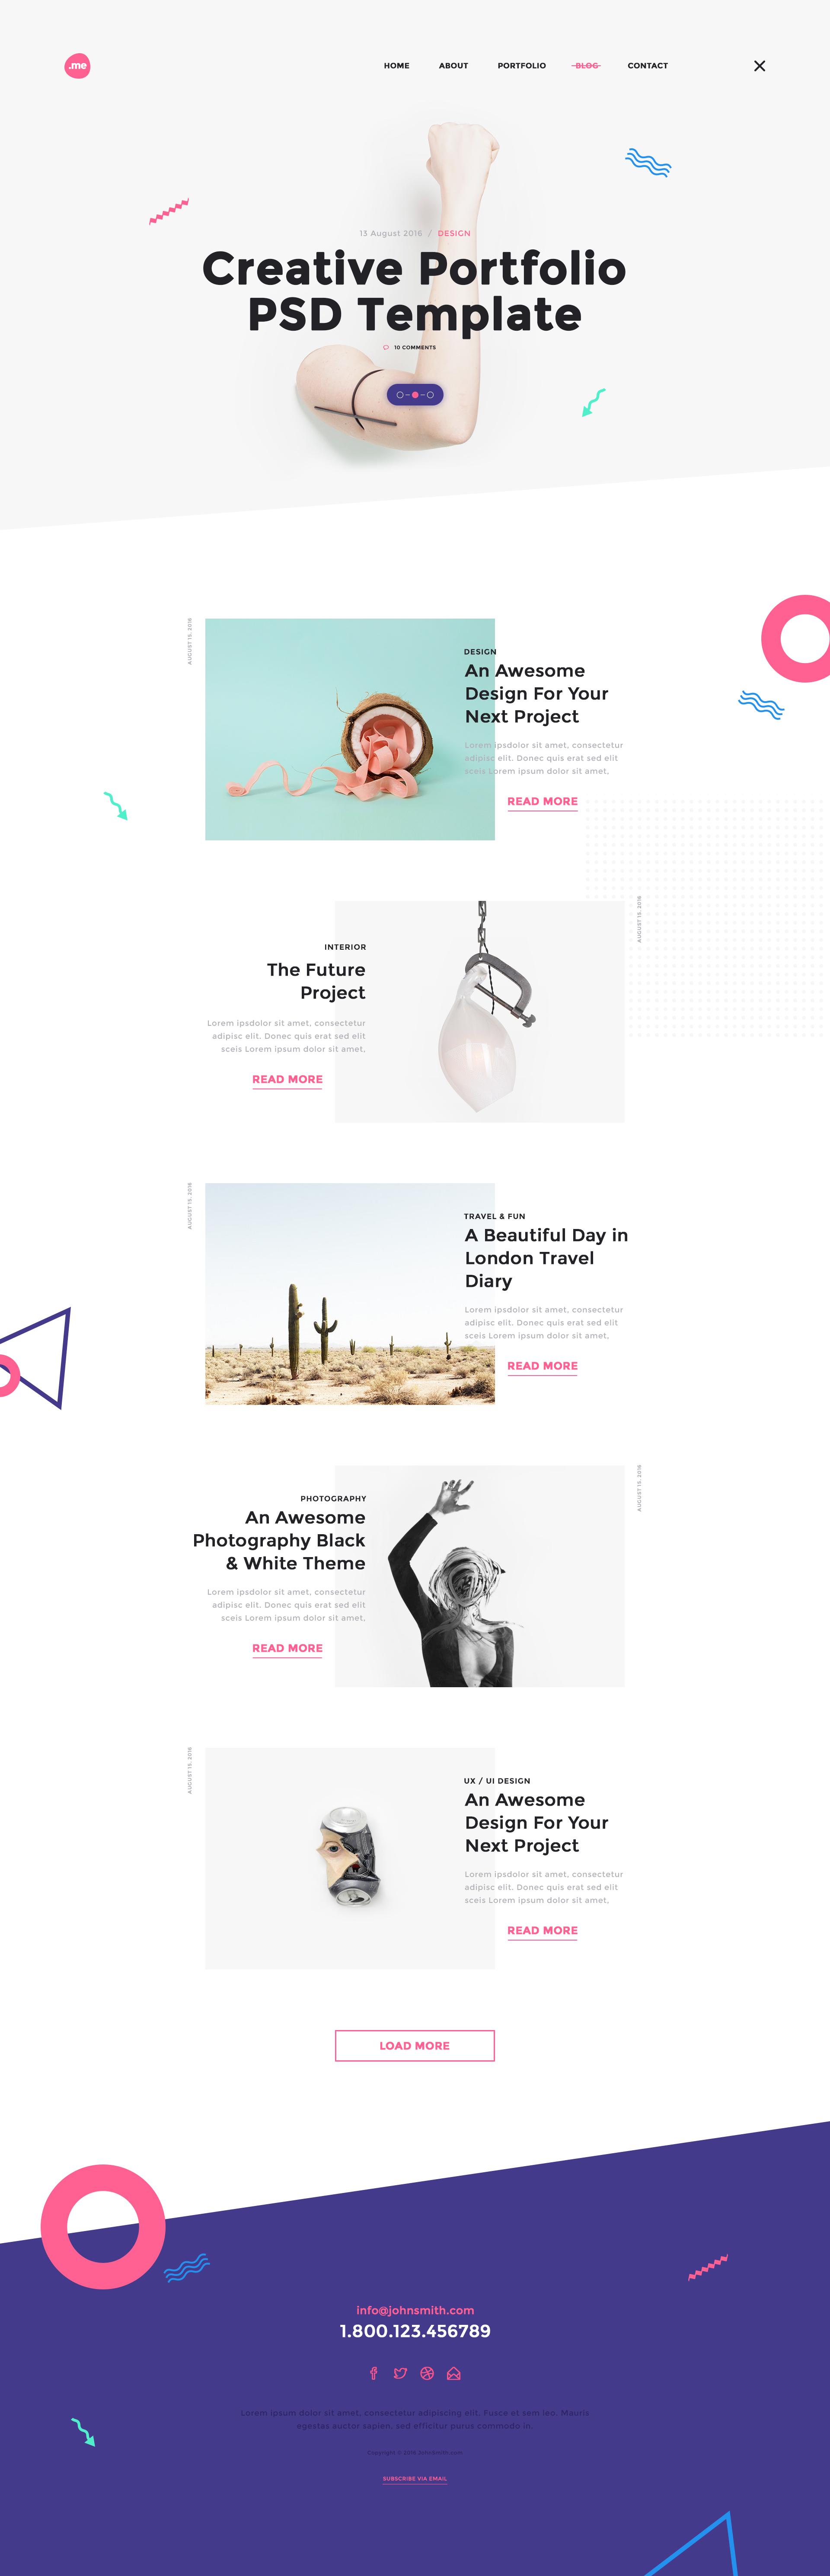 Me - Creative Portfolio & Resume / CV PSD Template by webduck ...